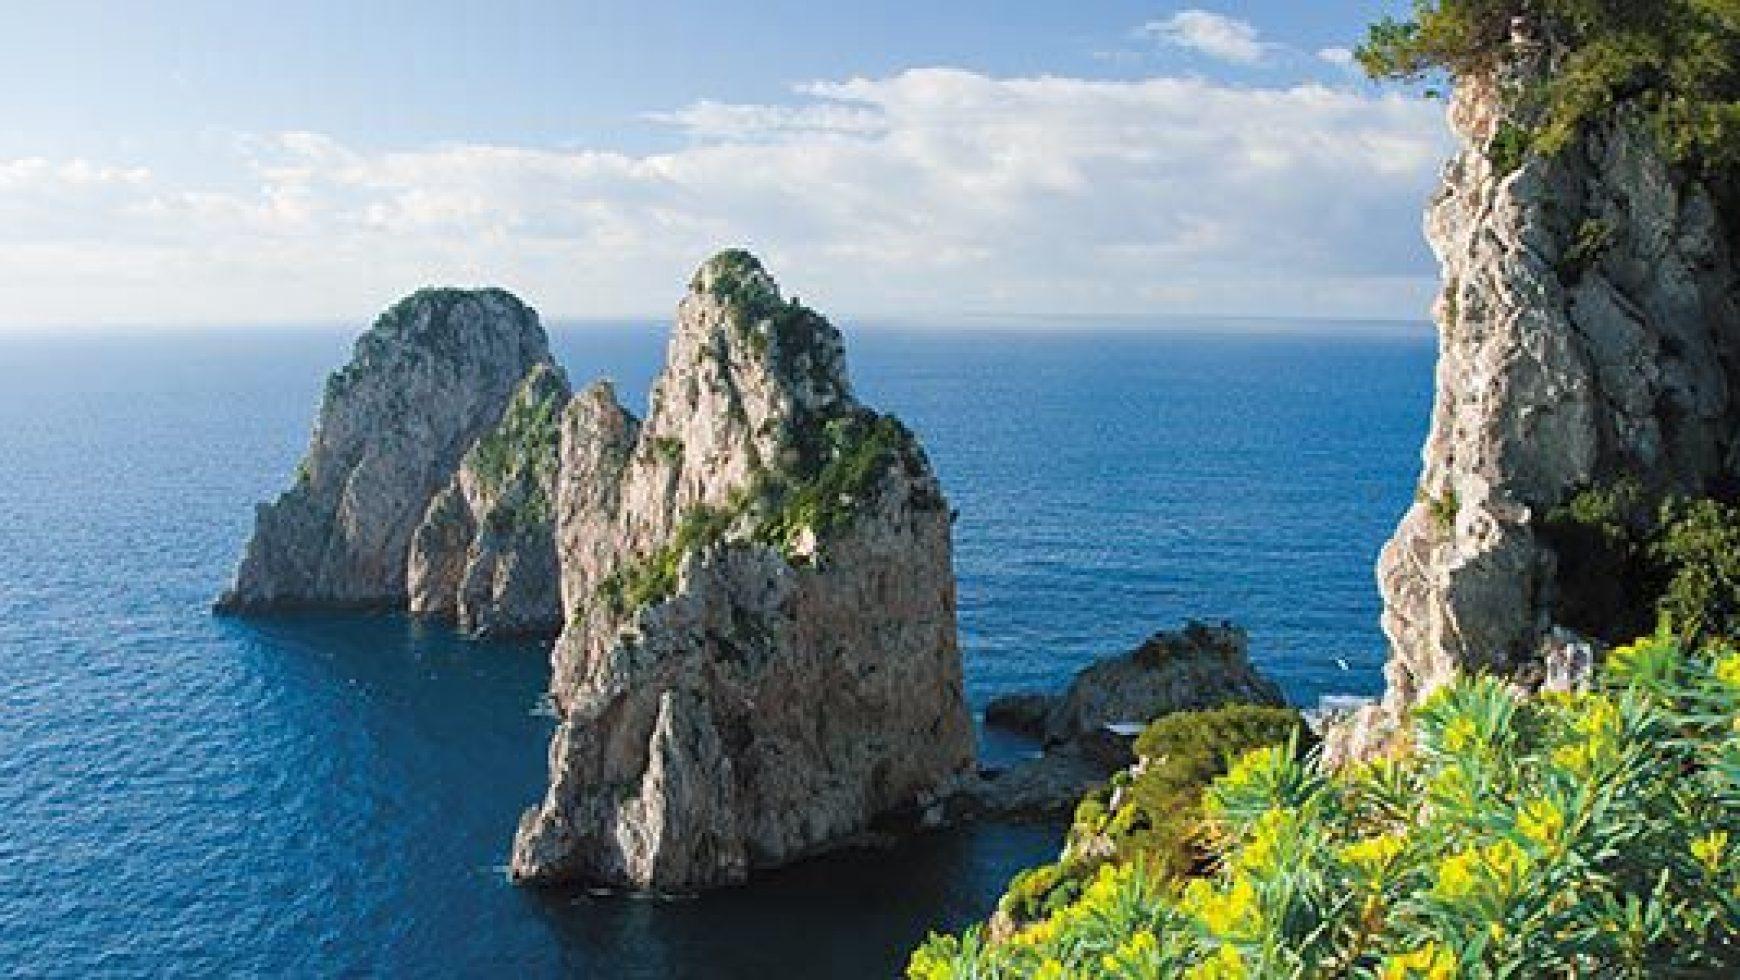 The Isle of Sirens